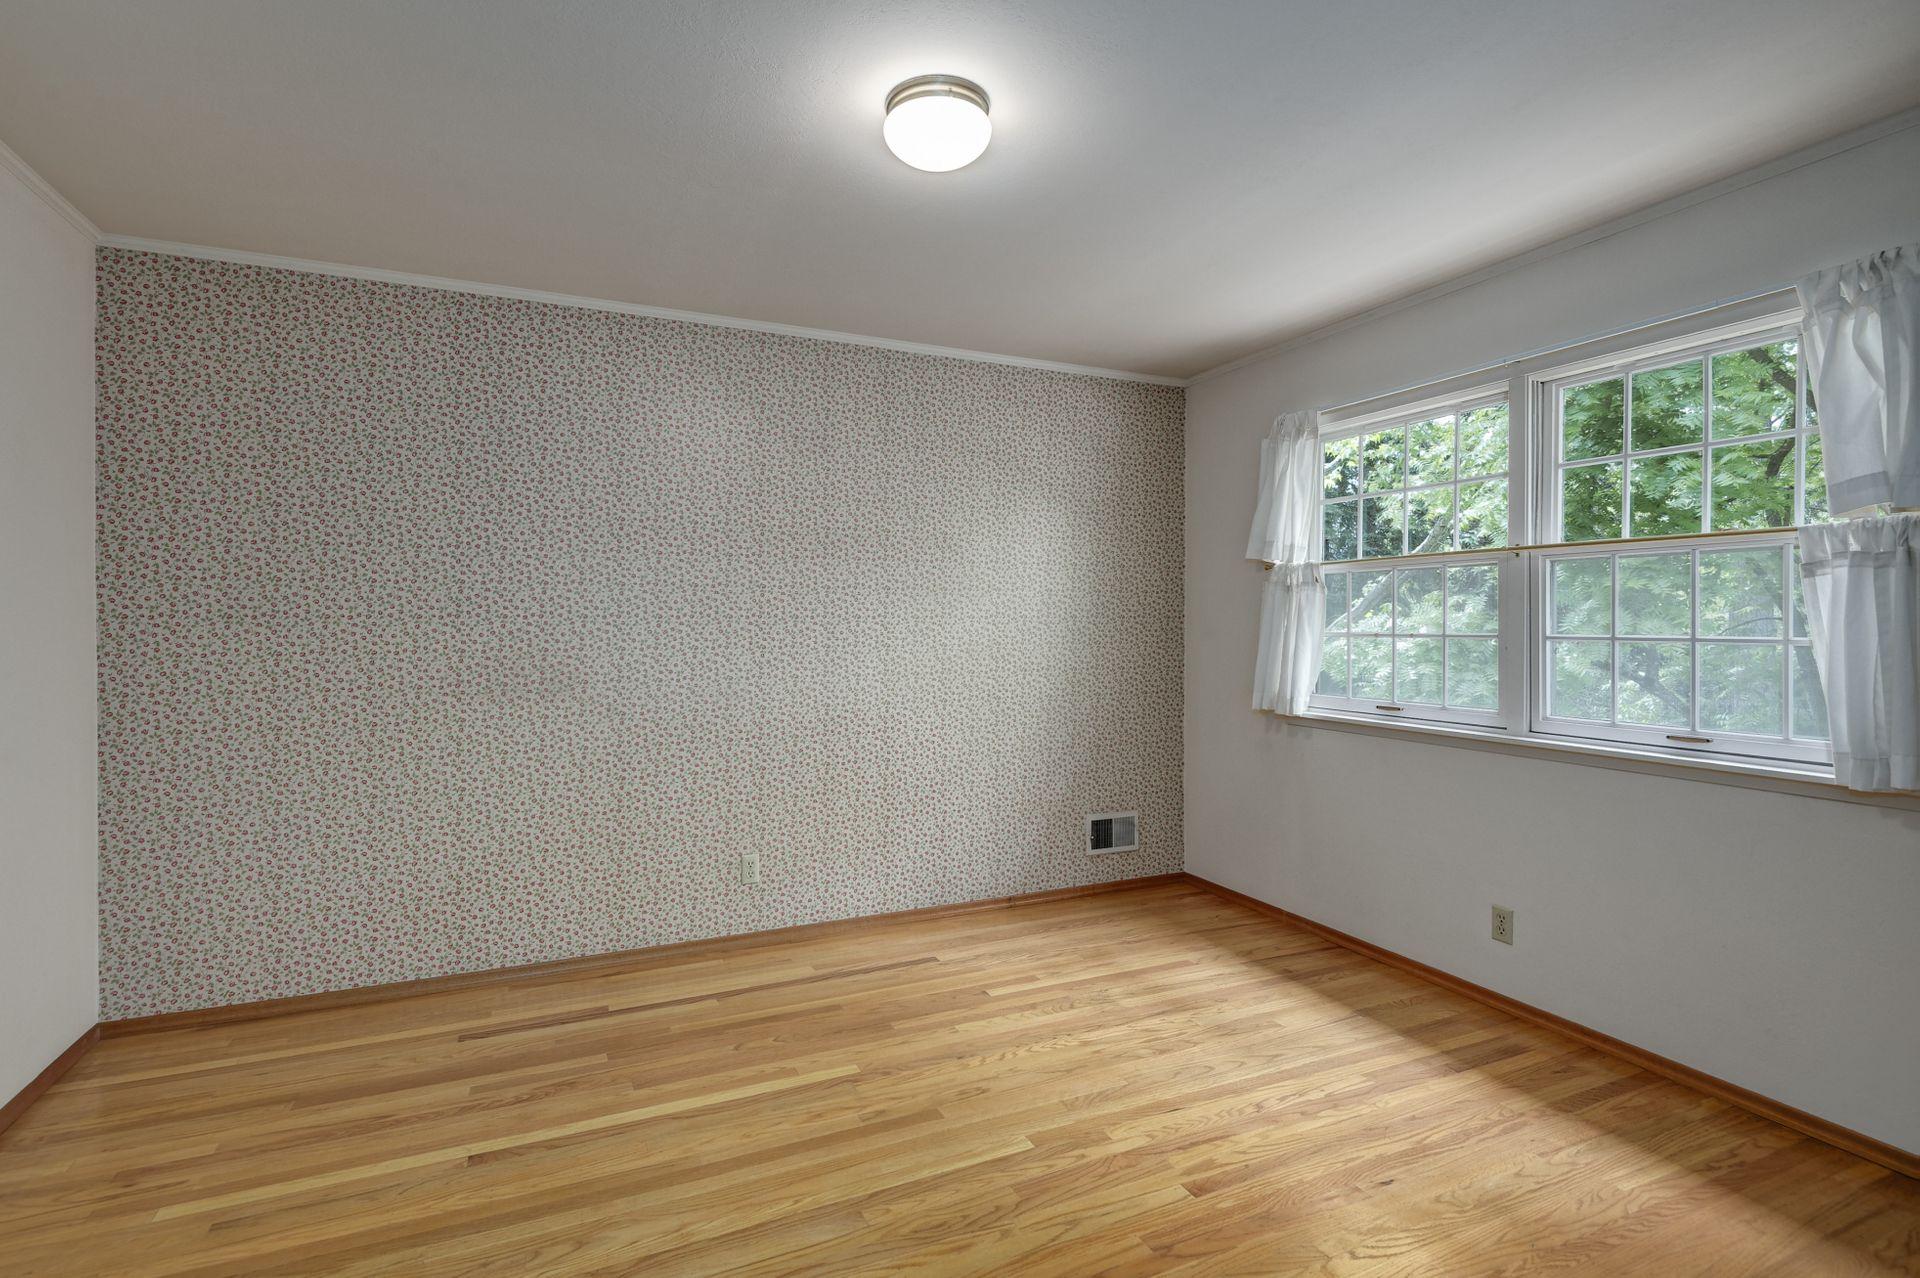 16_Bedroom.jpg